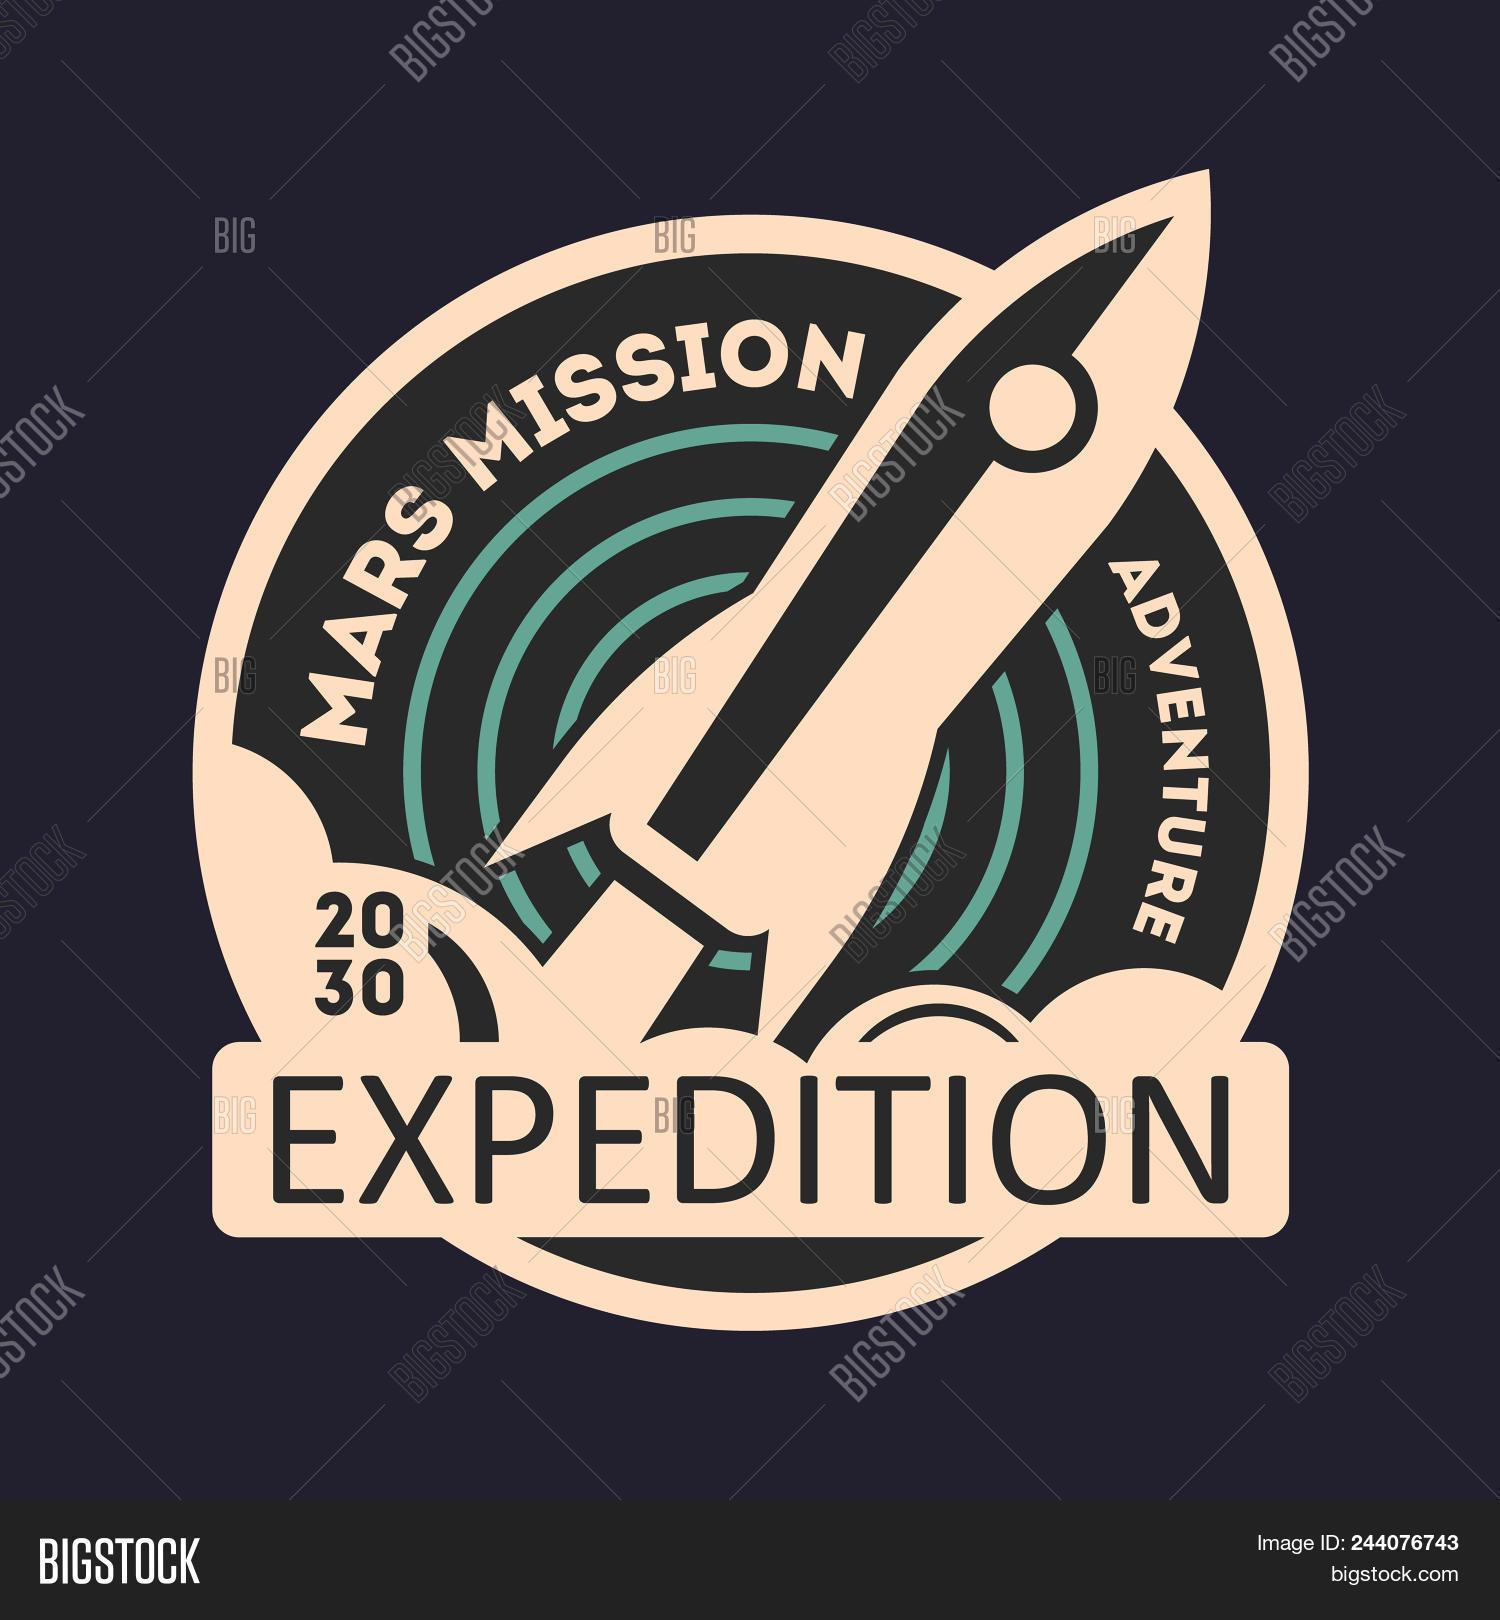 Mars Mission Vintage Image Photo Free Trial Bigstock